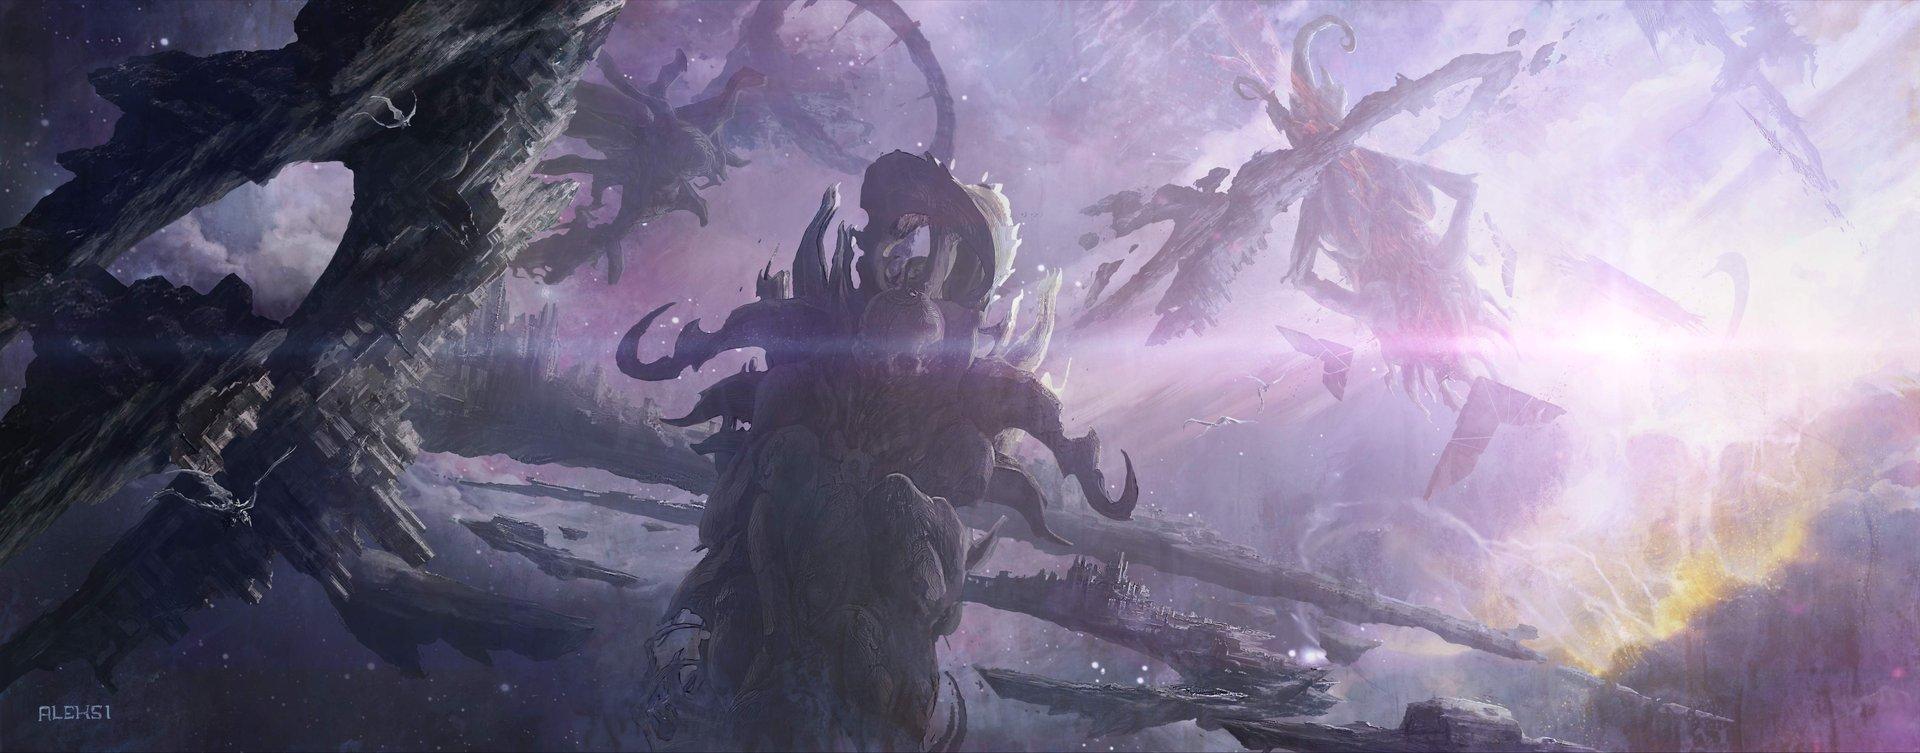 astral plane forgotten realms wiki fandom powered by wikia rh forgottenrealms wikia com Etheric Matter Ethereal Spirit